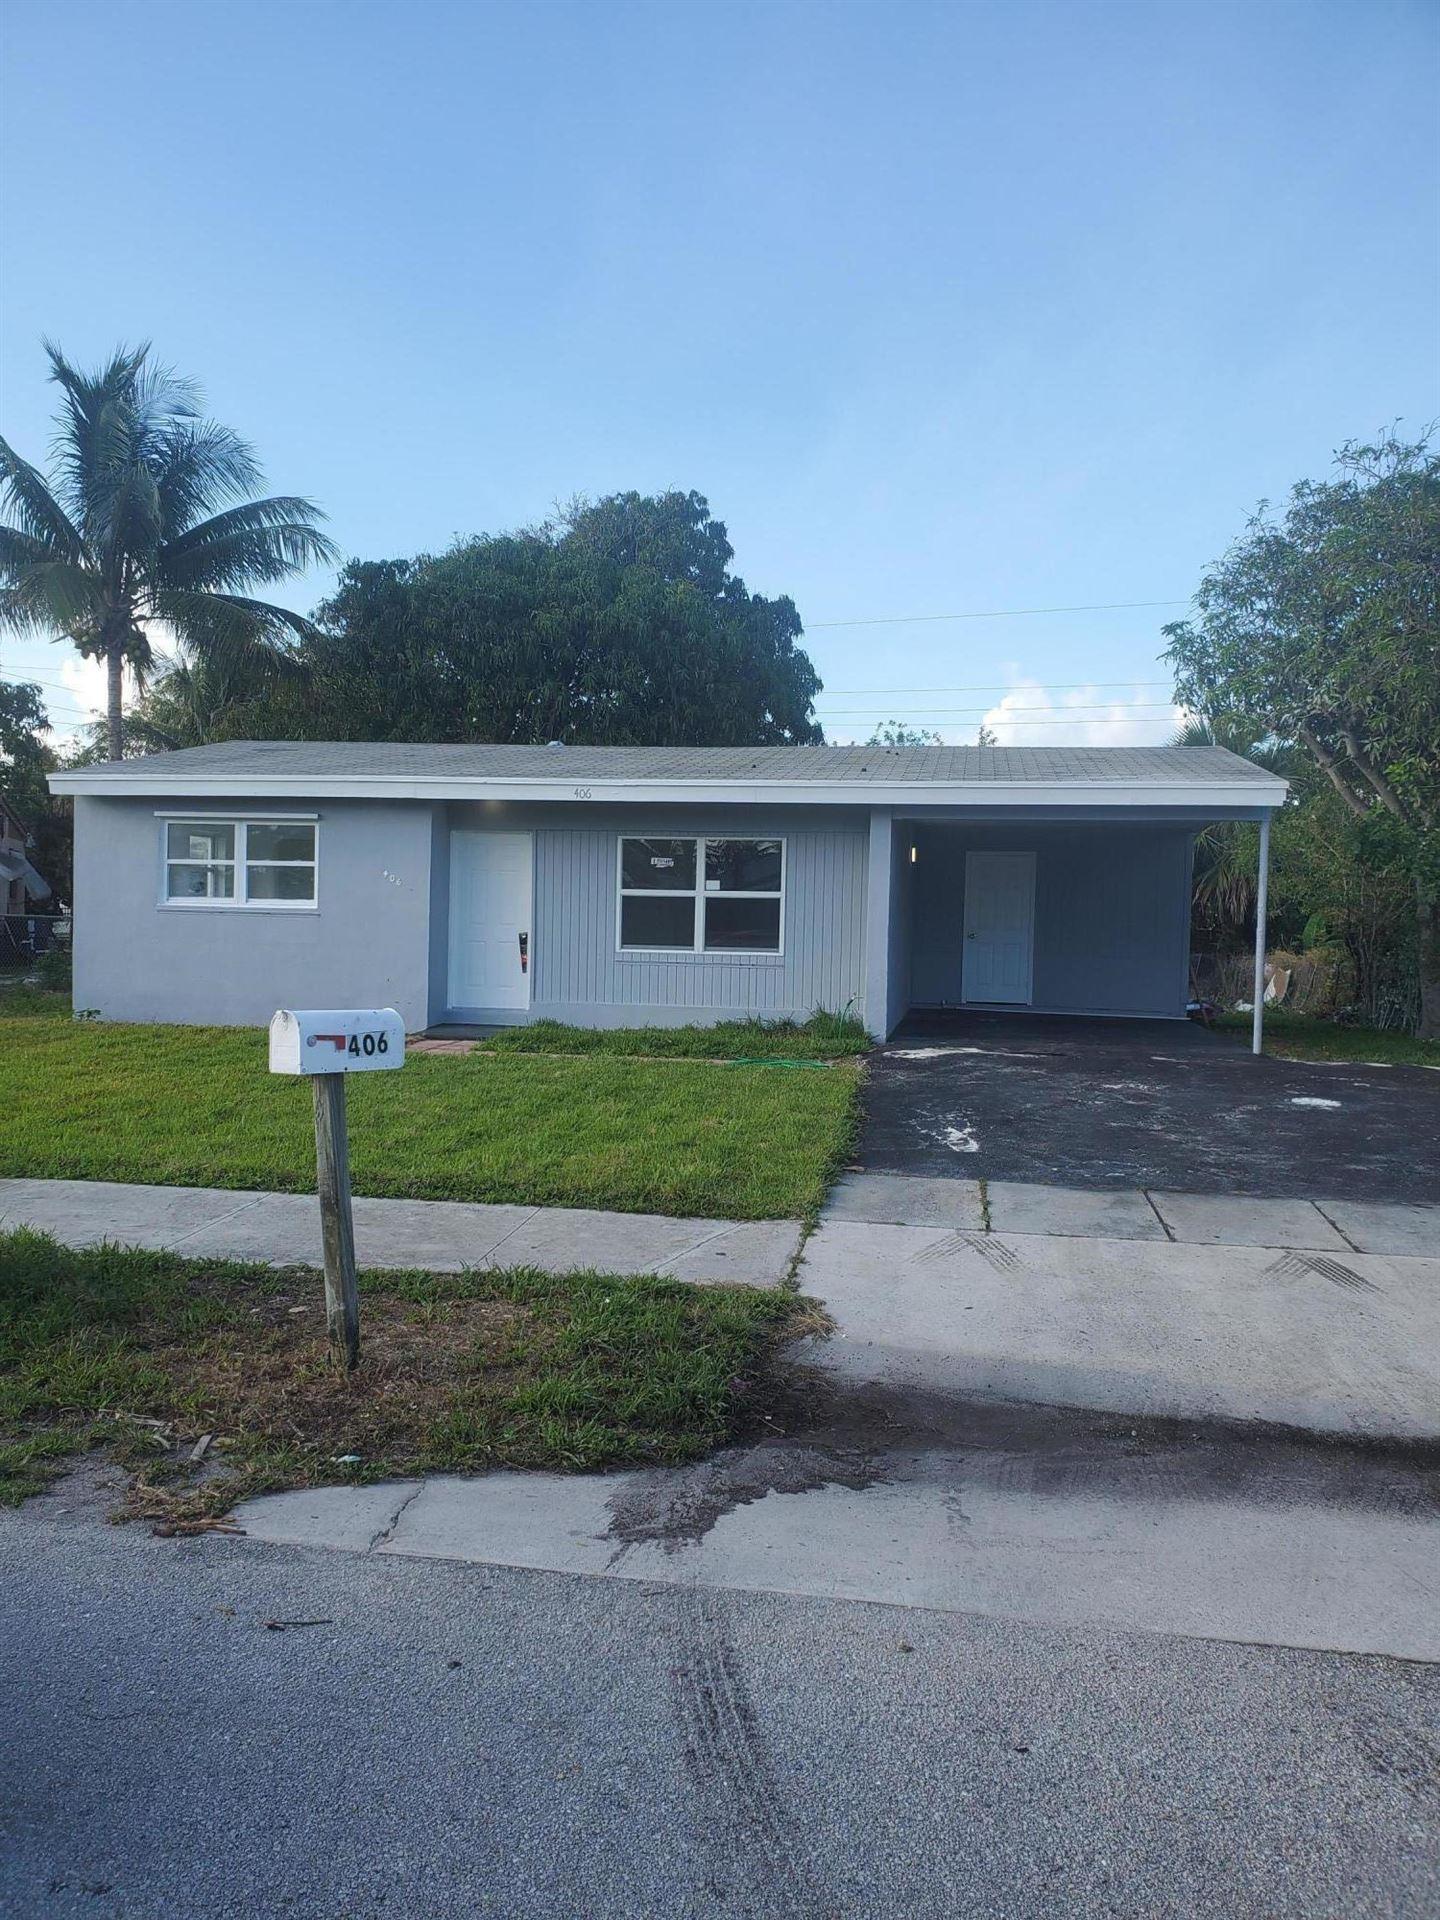 406 SW 9th Street, Delray Beach, FL 33444 - MLS#: RX-10721129